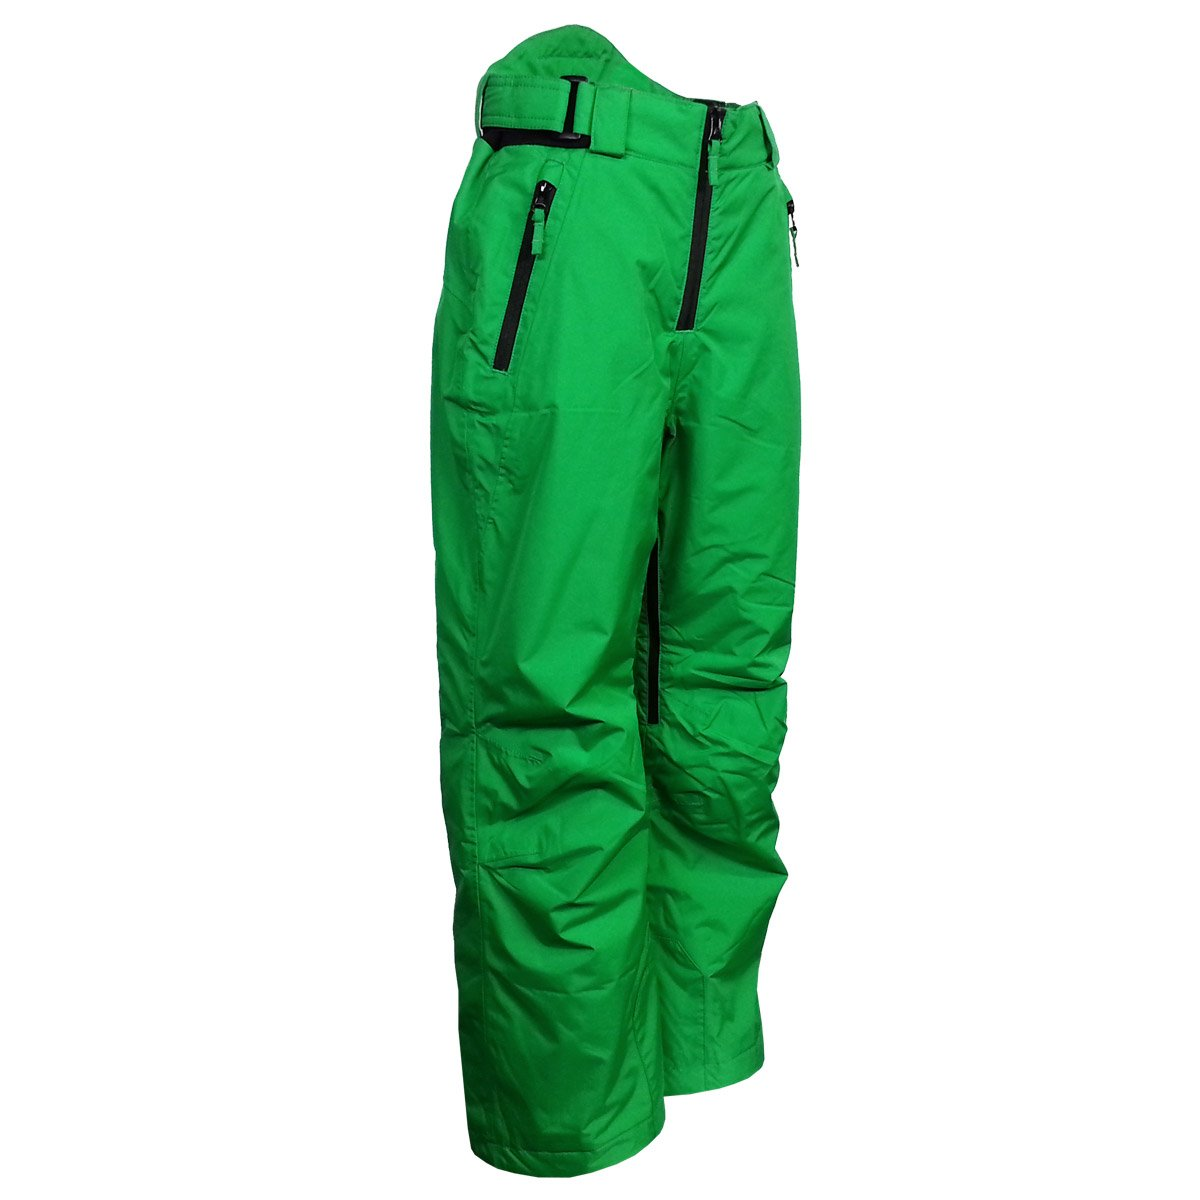 VÖLKL GEISHA PANTS Kinder Skihose 5.000 Snowboardhose Molten Gras Grün 412313 online kaufen